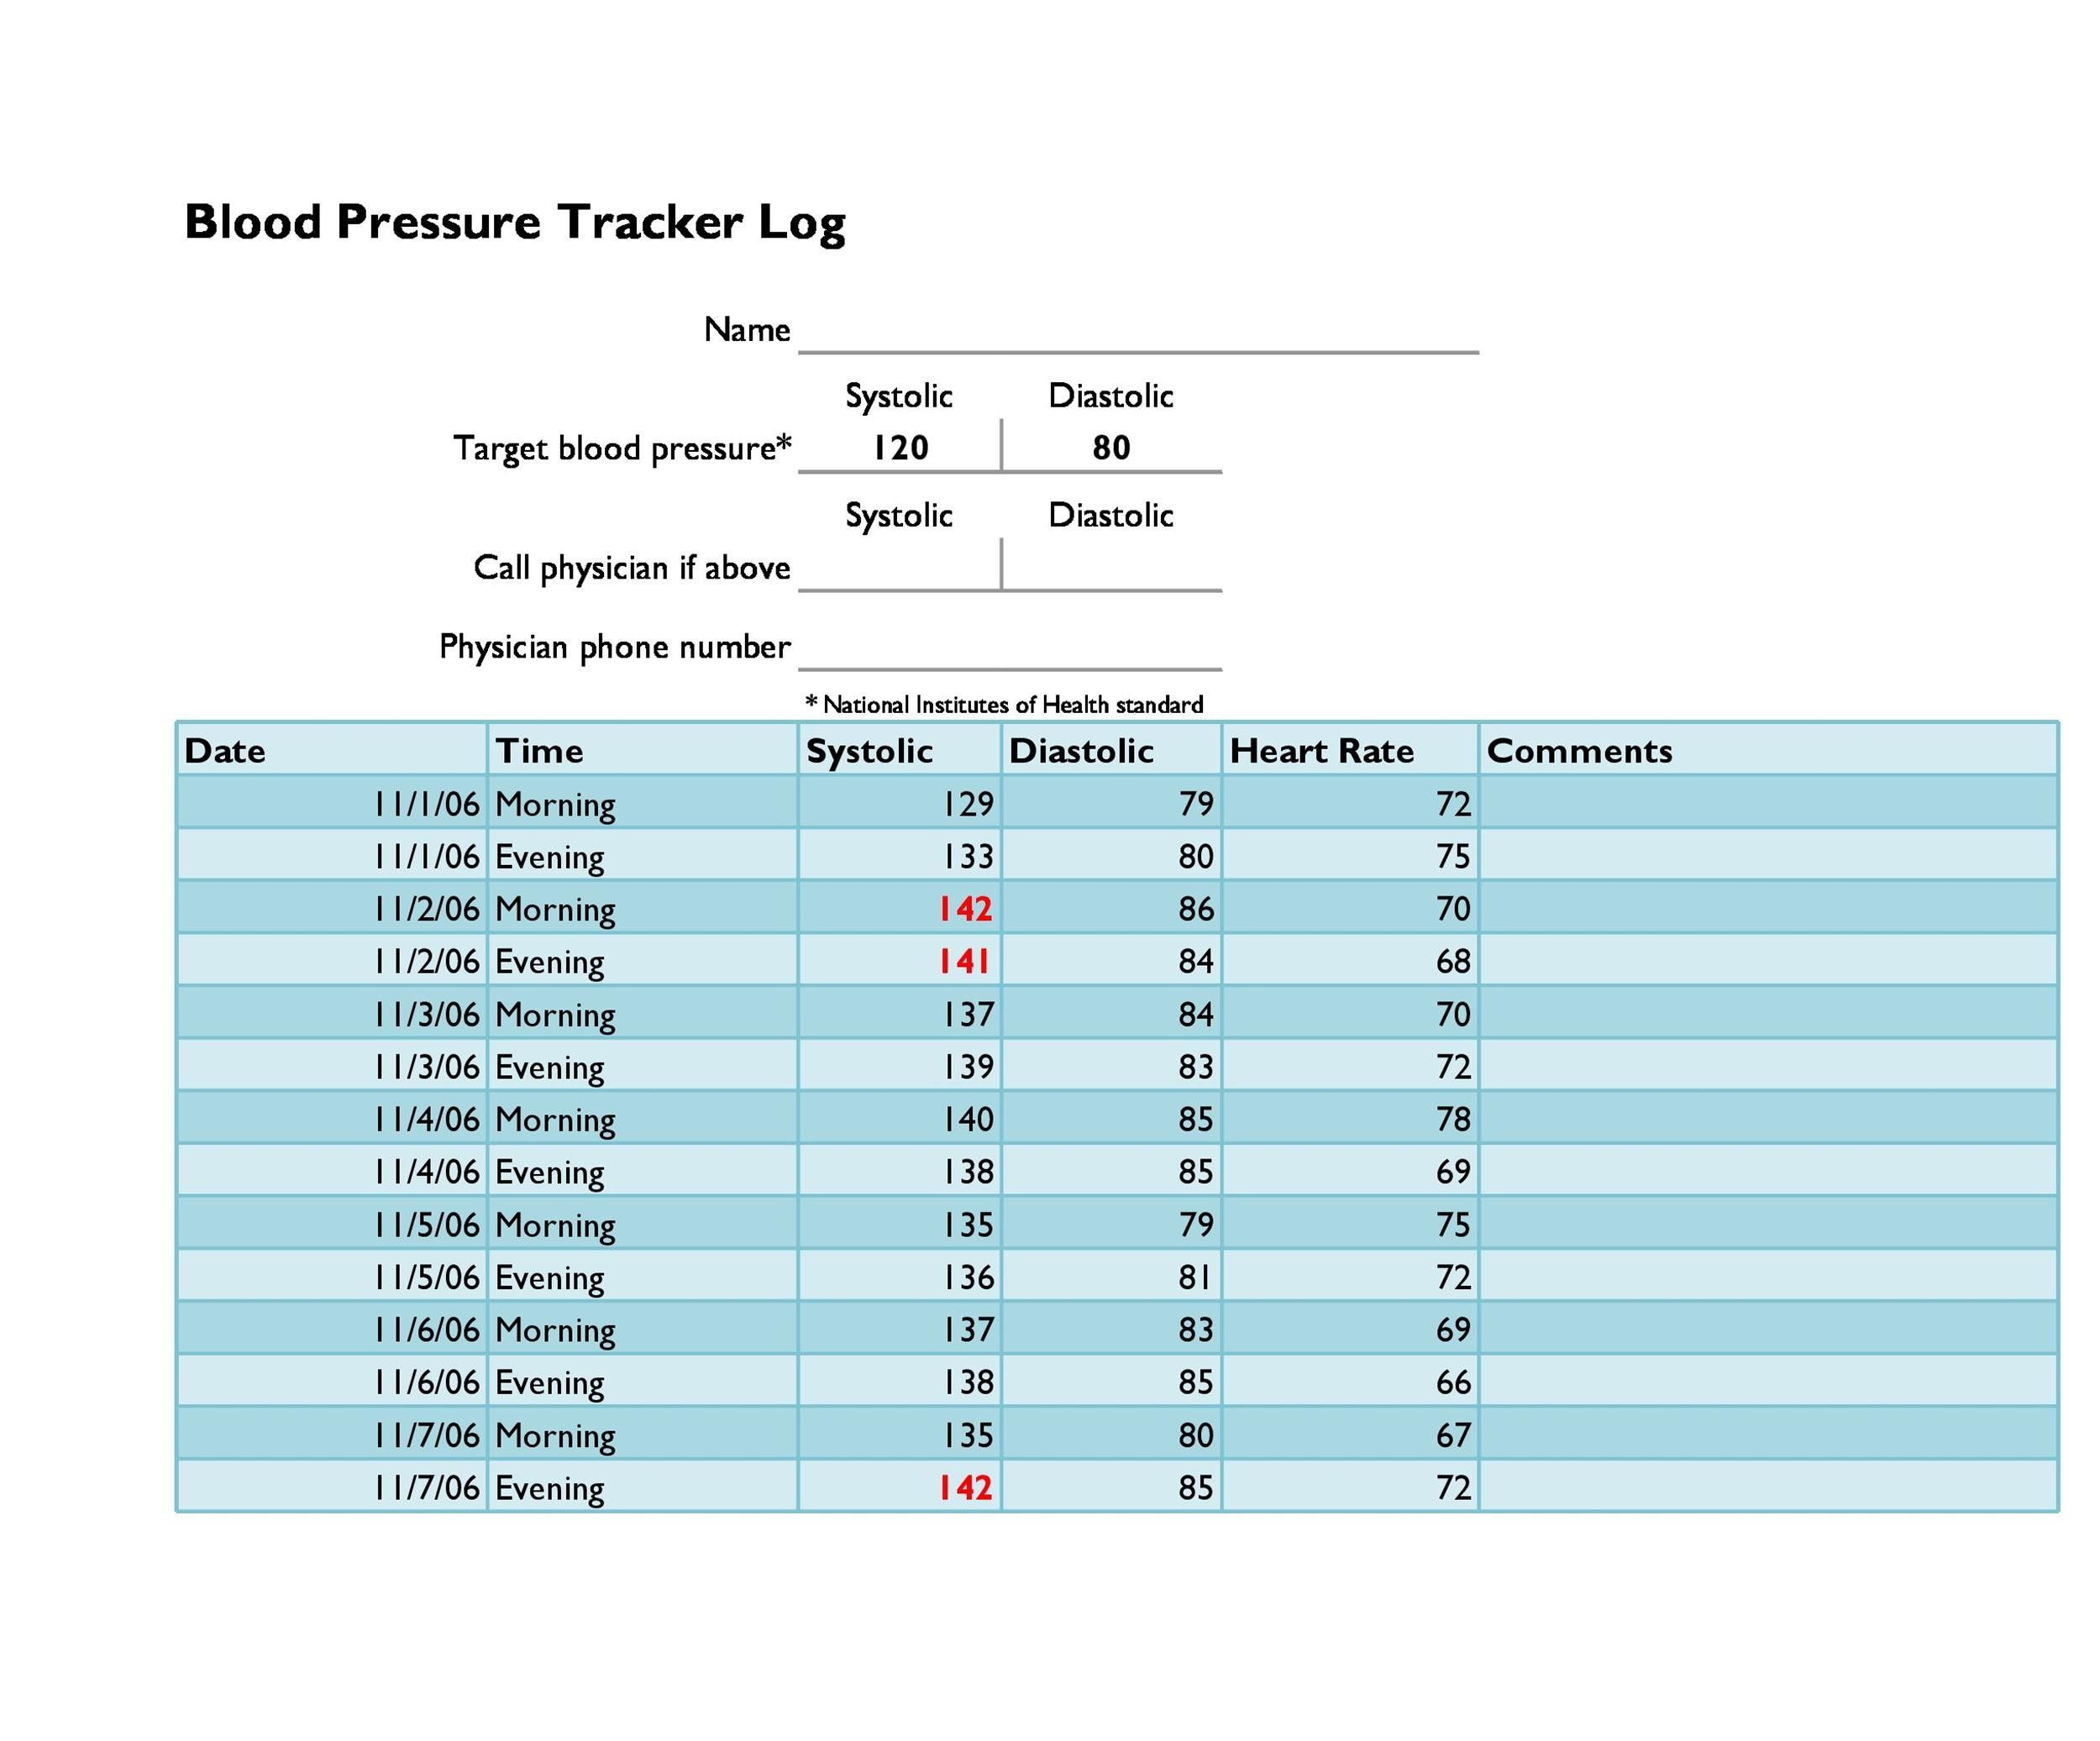 30+ Printable Blood Pressure Log Templates - Template Lab - blood pressure and blood sugar log sheet